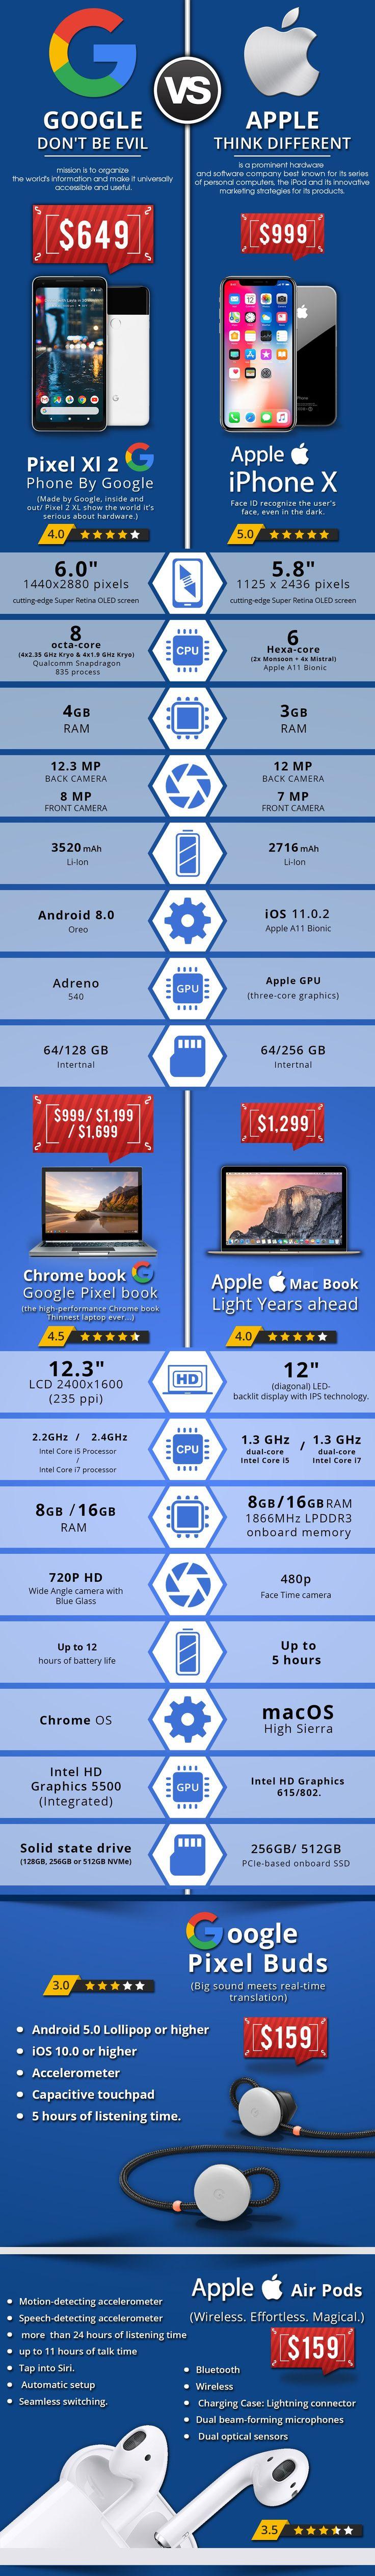 Google vs Apple - #infographic